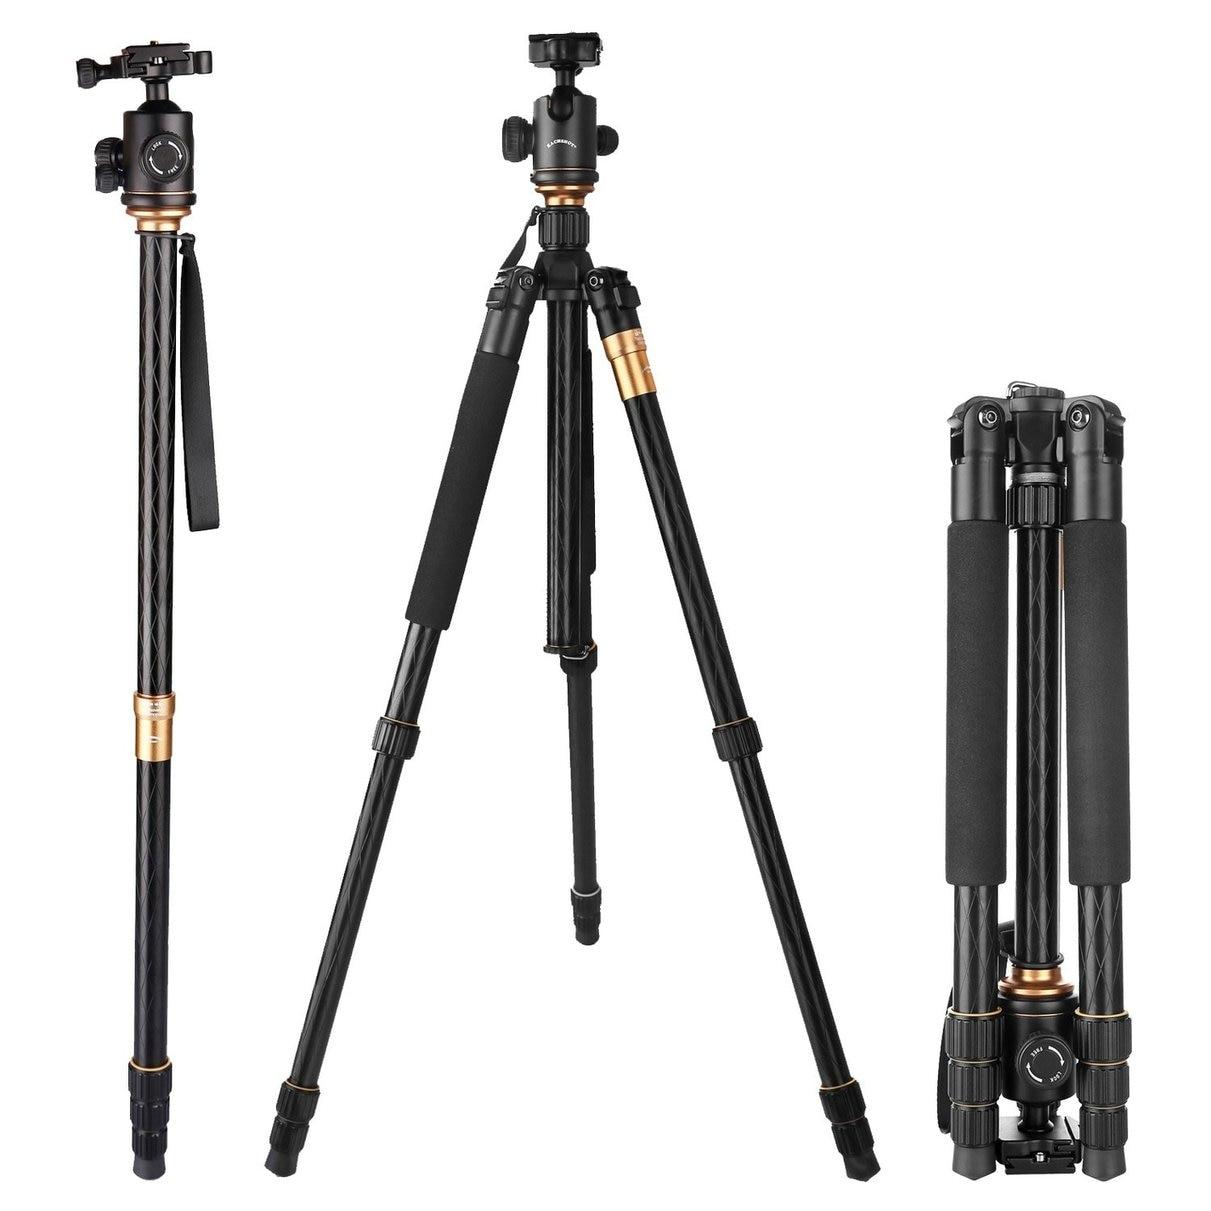 EACHSHOT Q999 Photographic Portable Tripod To Monopod+Ball Head For Digital SLR DSLR Camera Fold 43cm Max Loading 15Kg